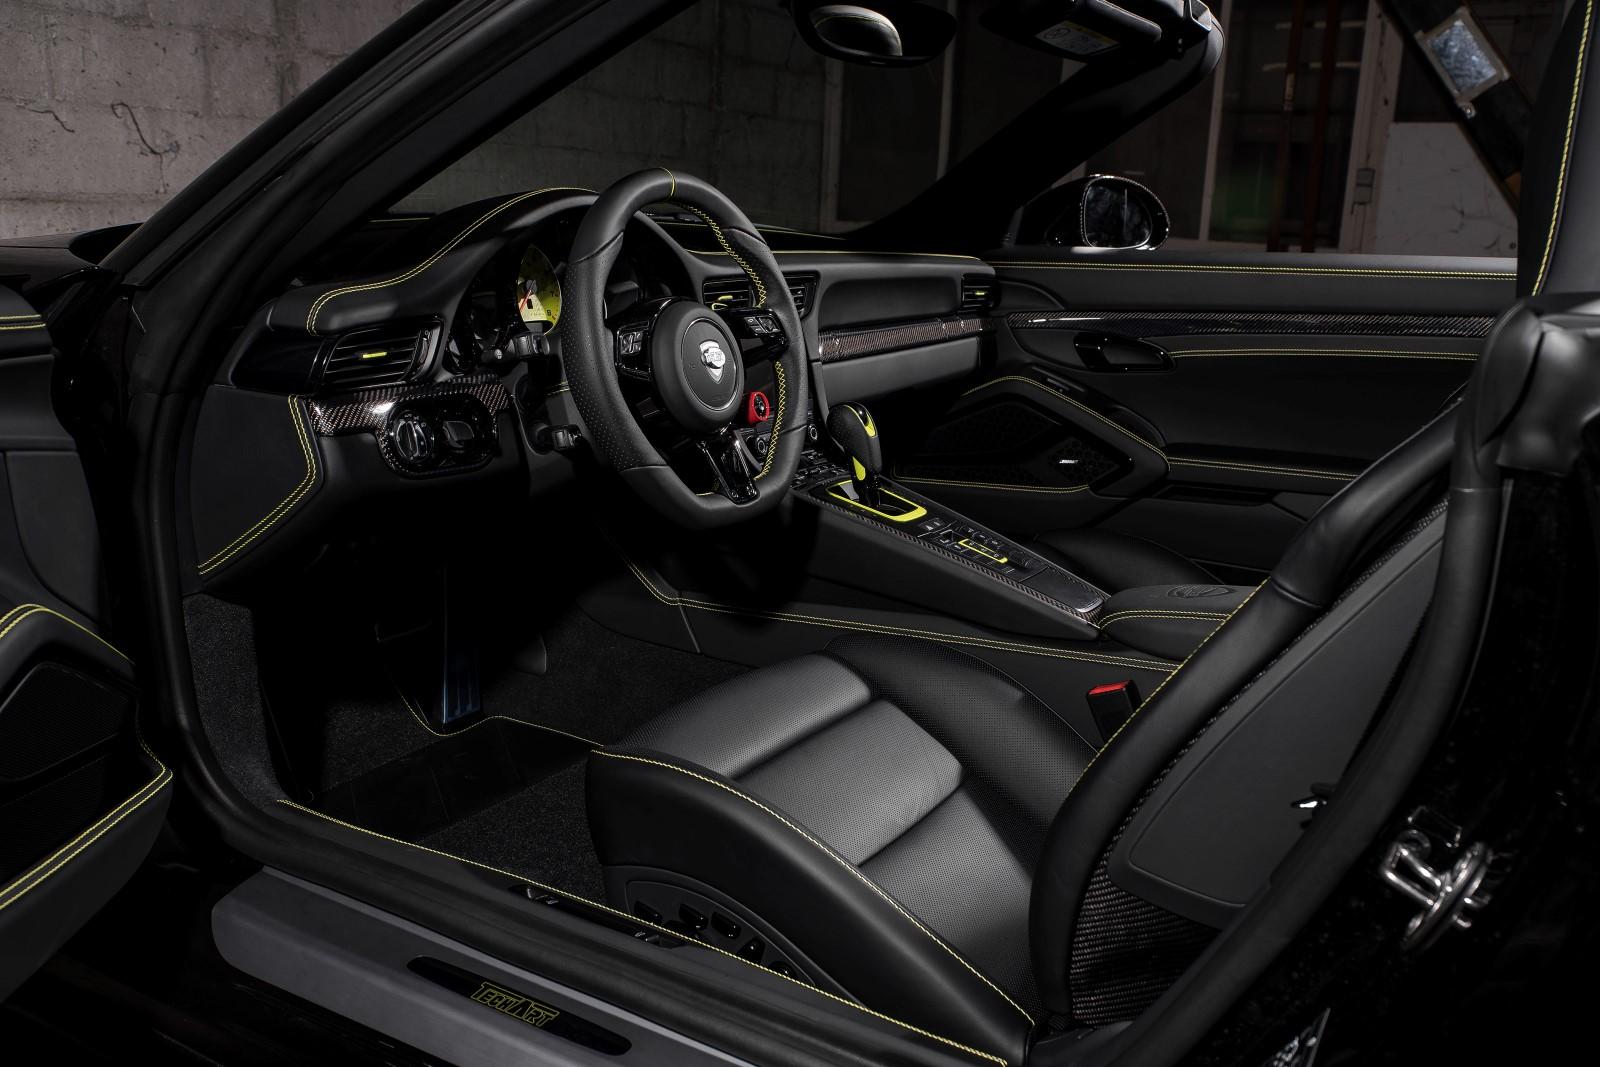 TechArt Porsche 911 991.2 Turbo S Cabriolet